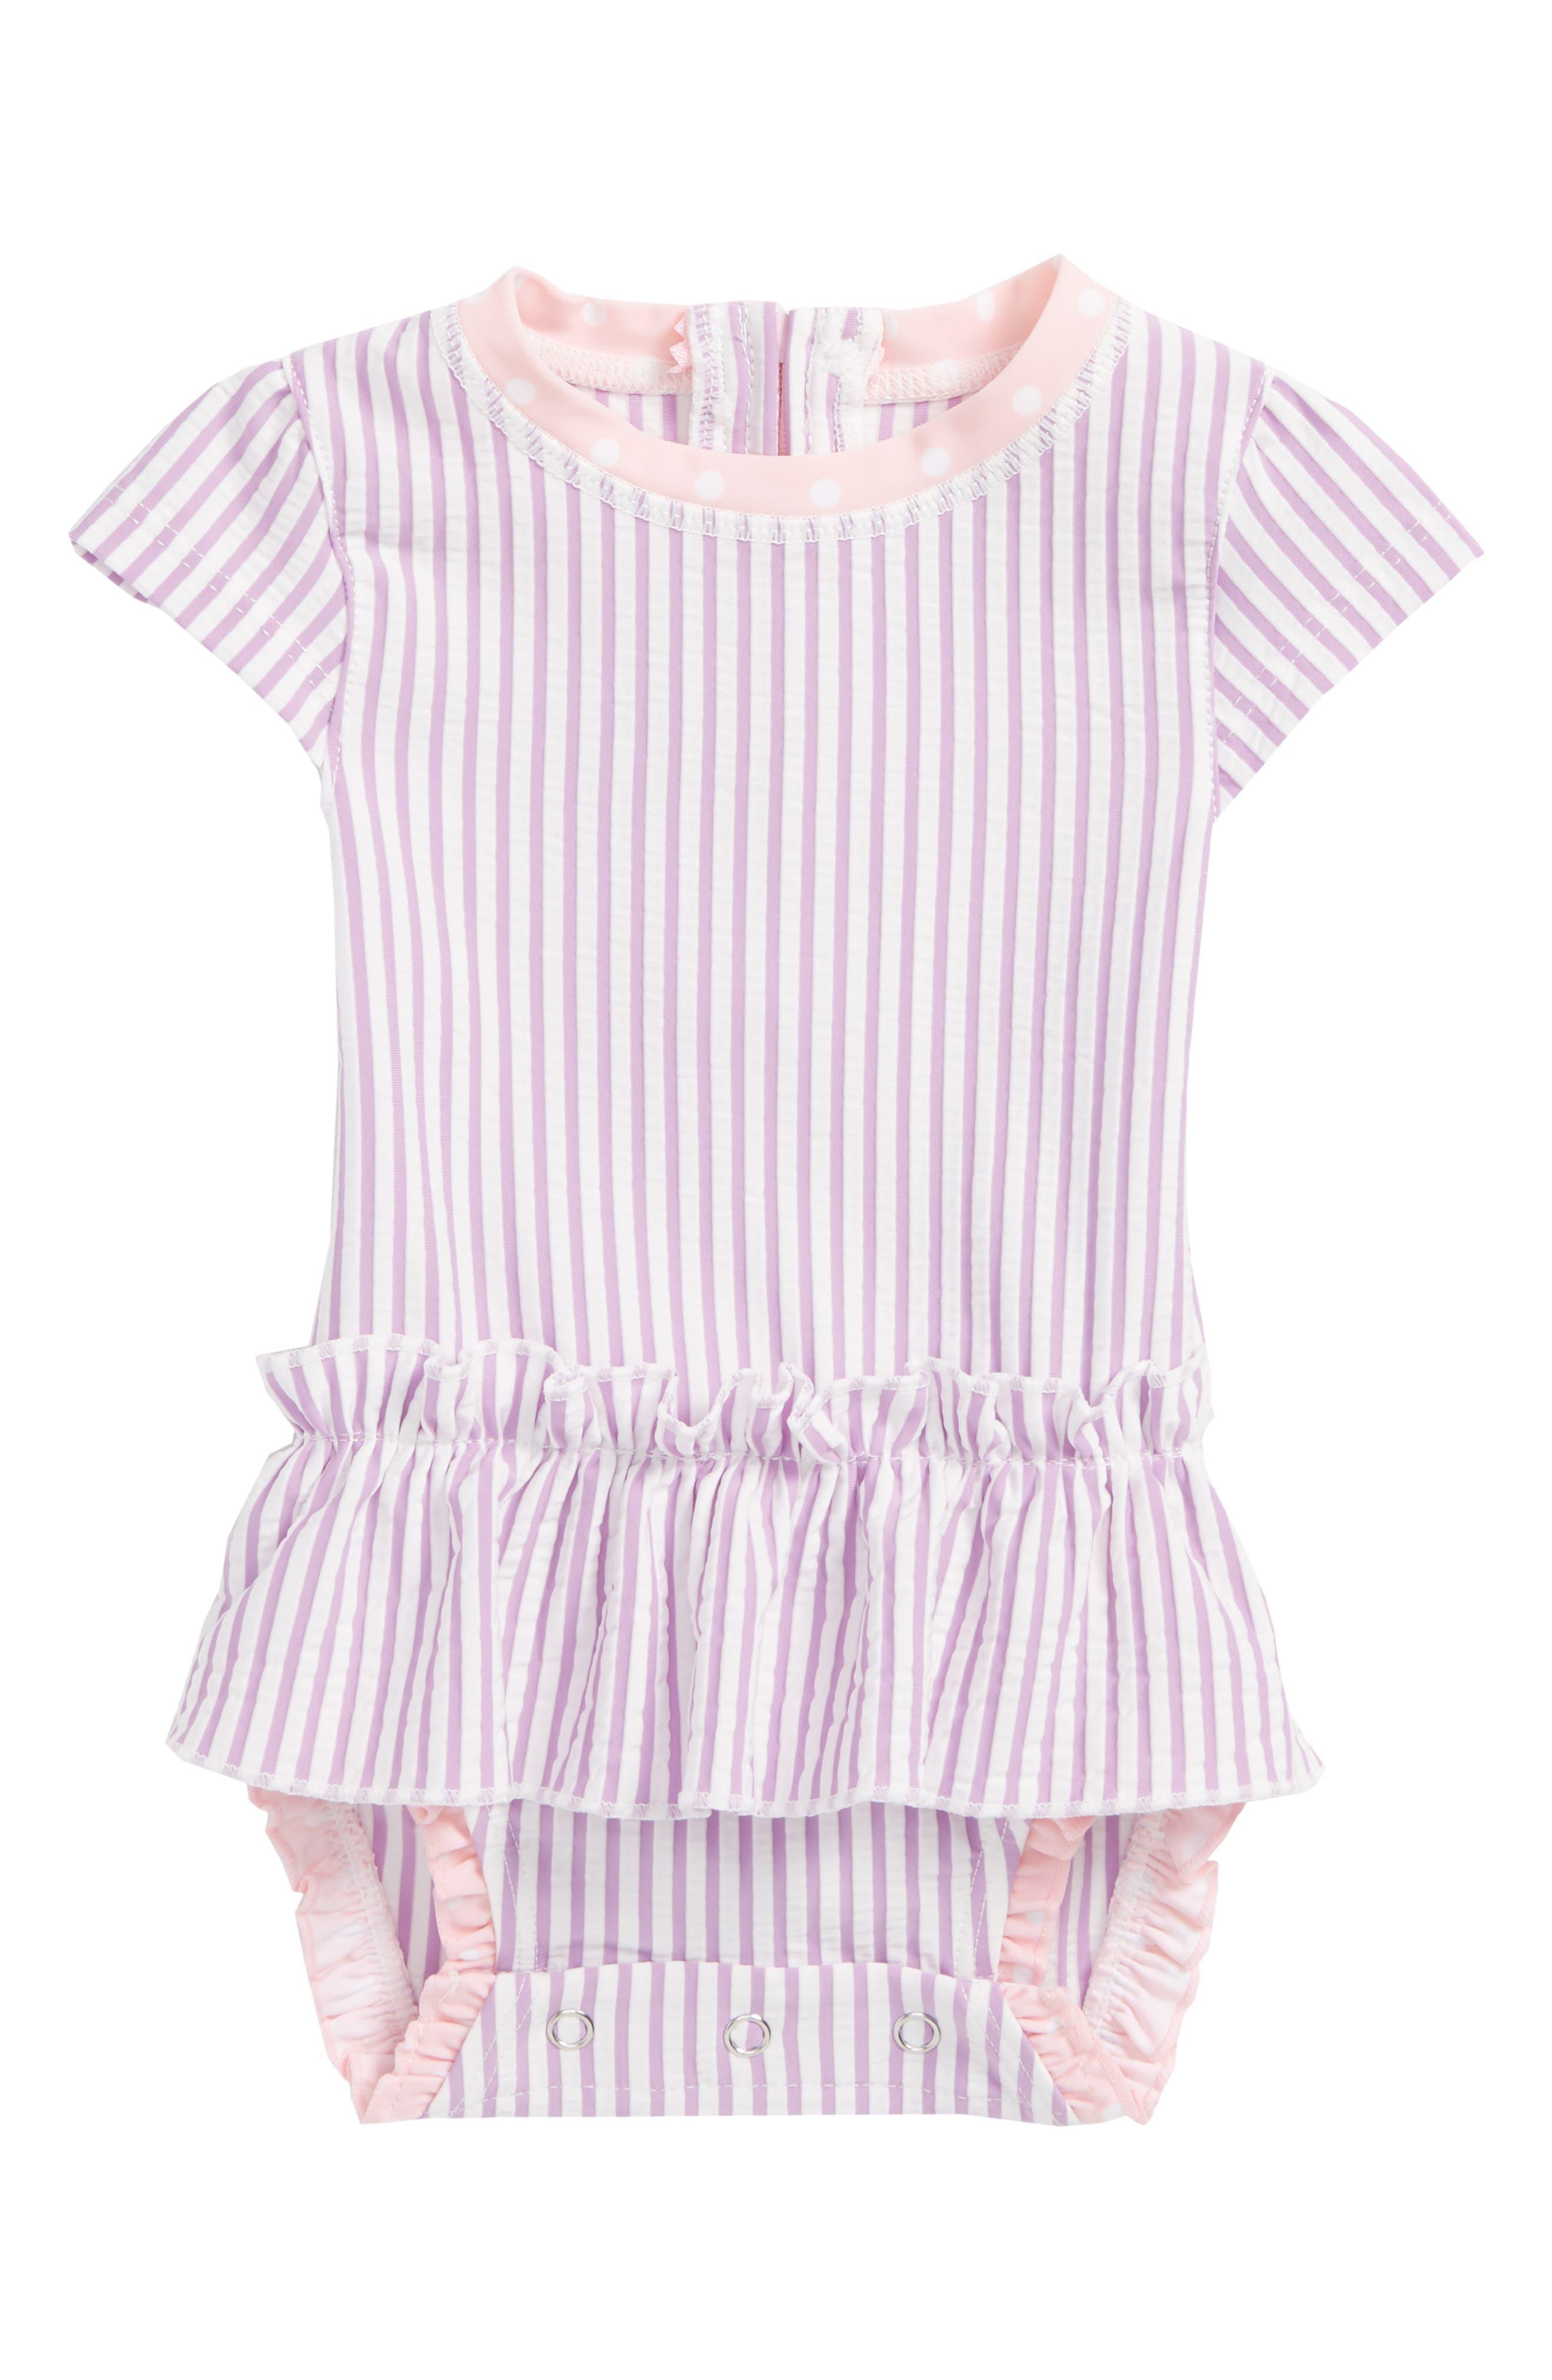 RuffleButts Lilac Peplum One-Piece Swimsuit (Baby Girls)